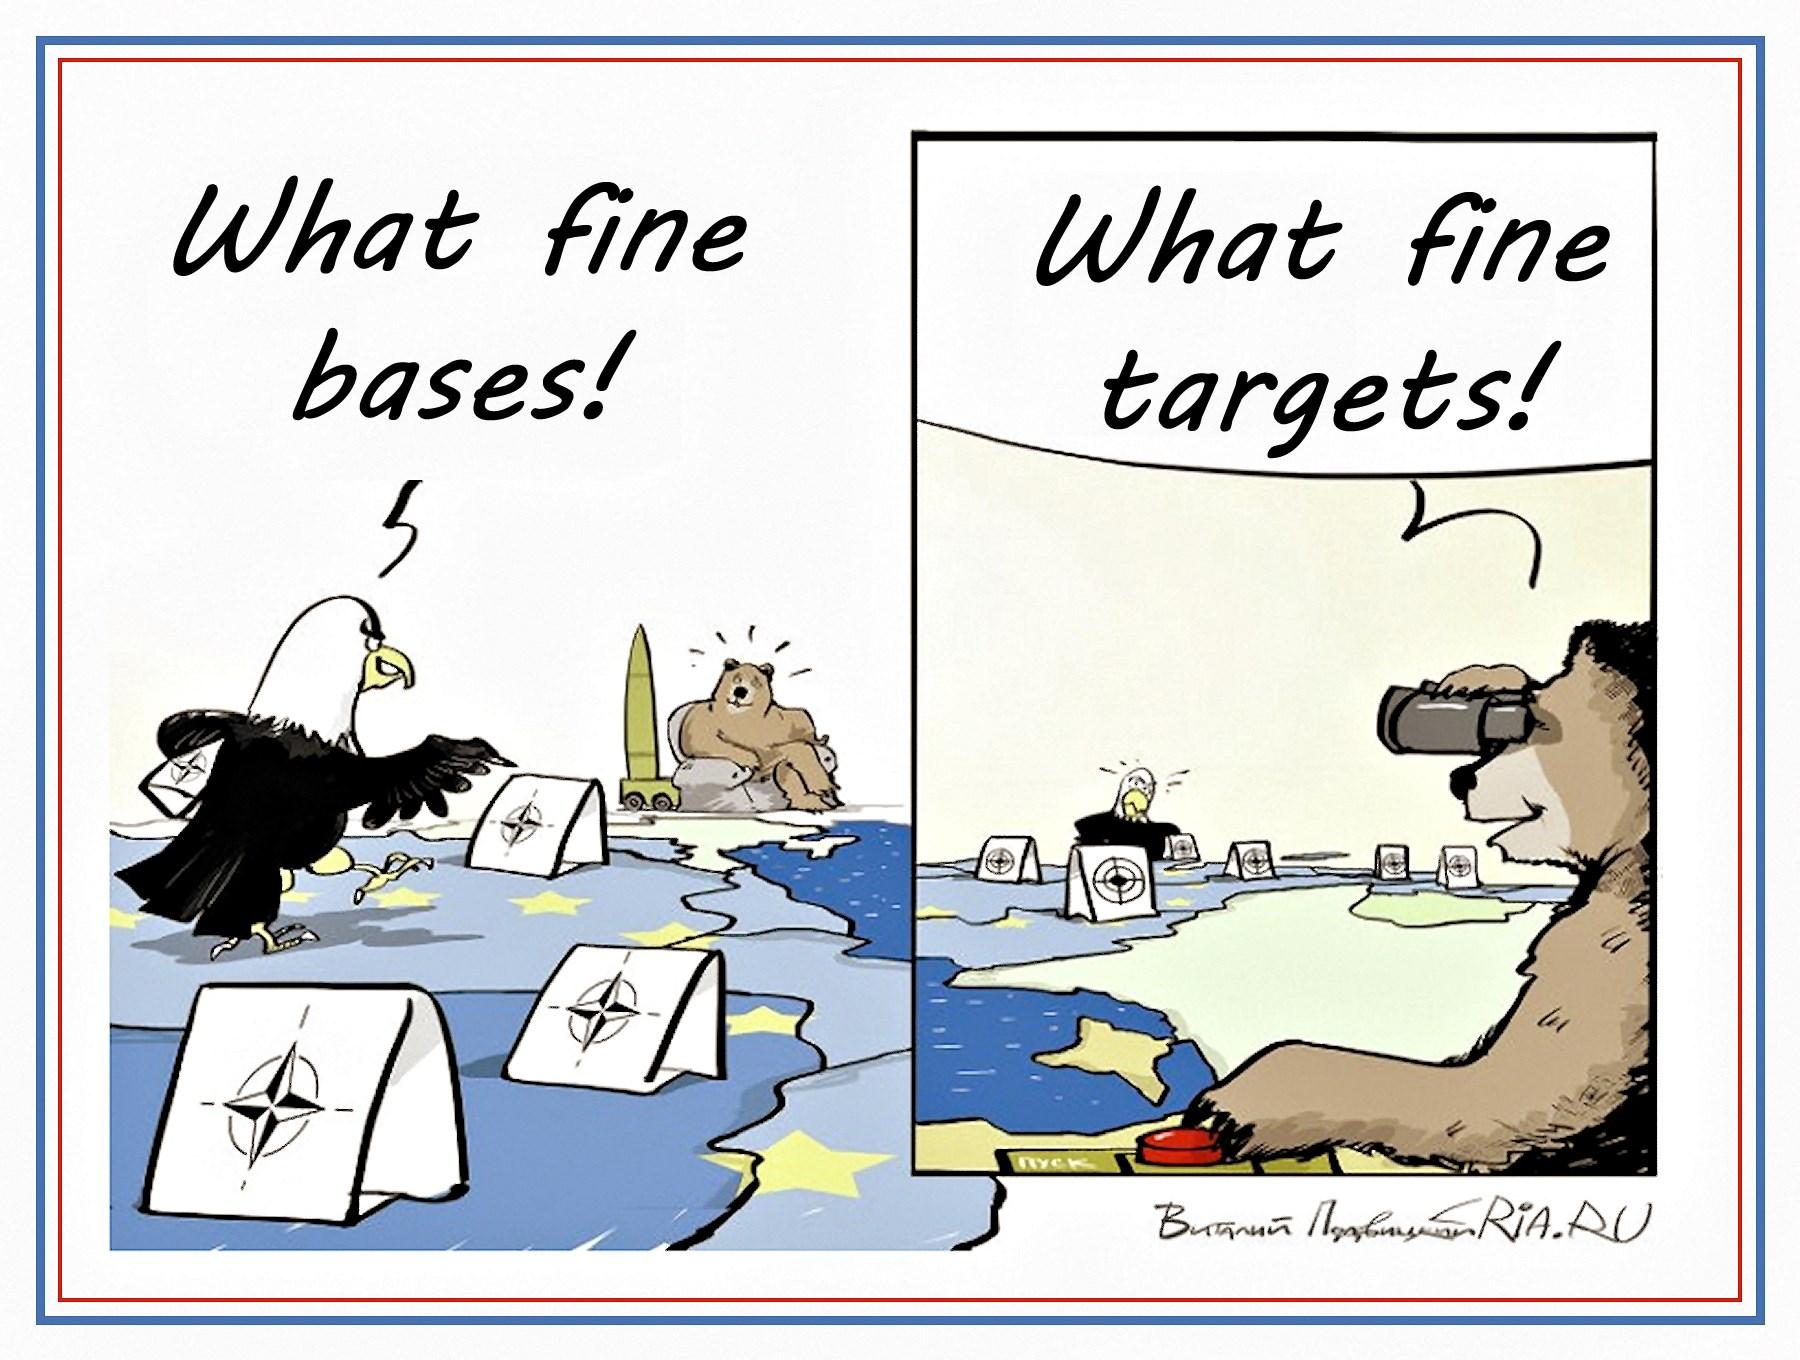 00 Vitaly Podvitsky. What Fine Targets! 2014